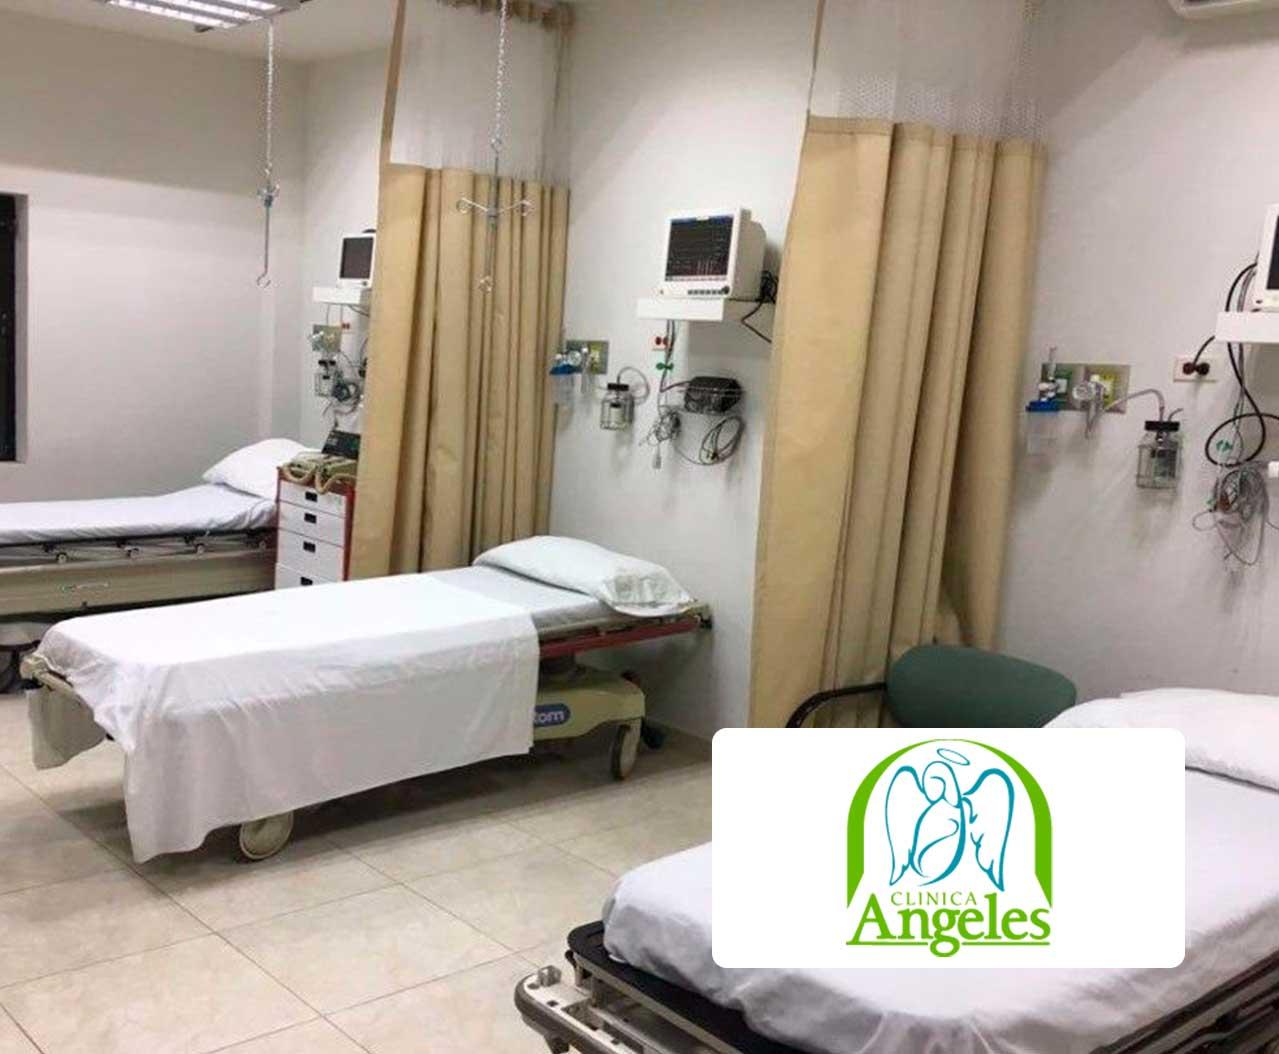 Clinica Hospital Angeles